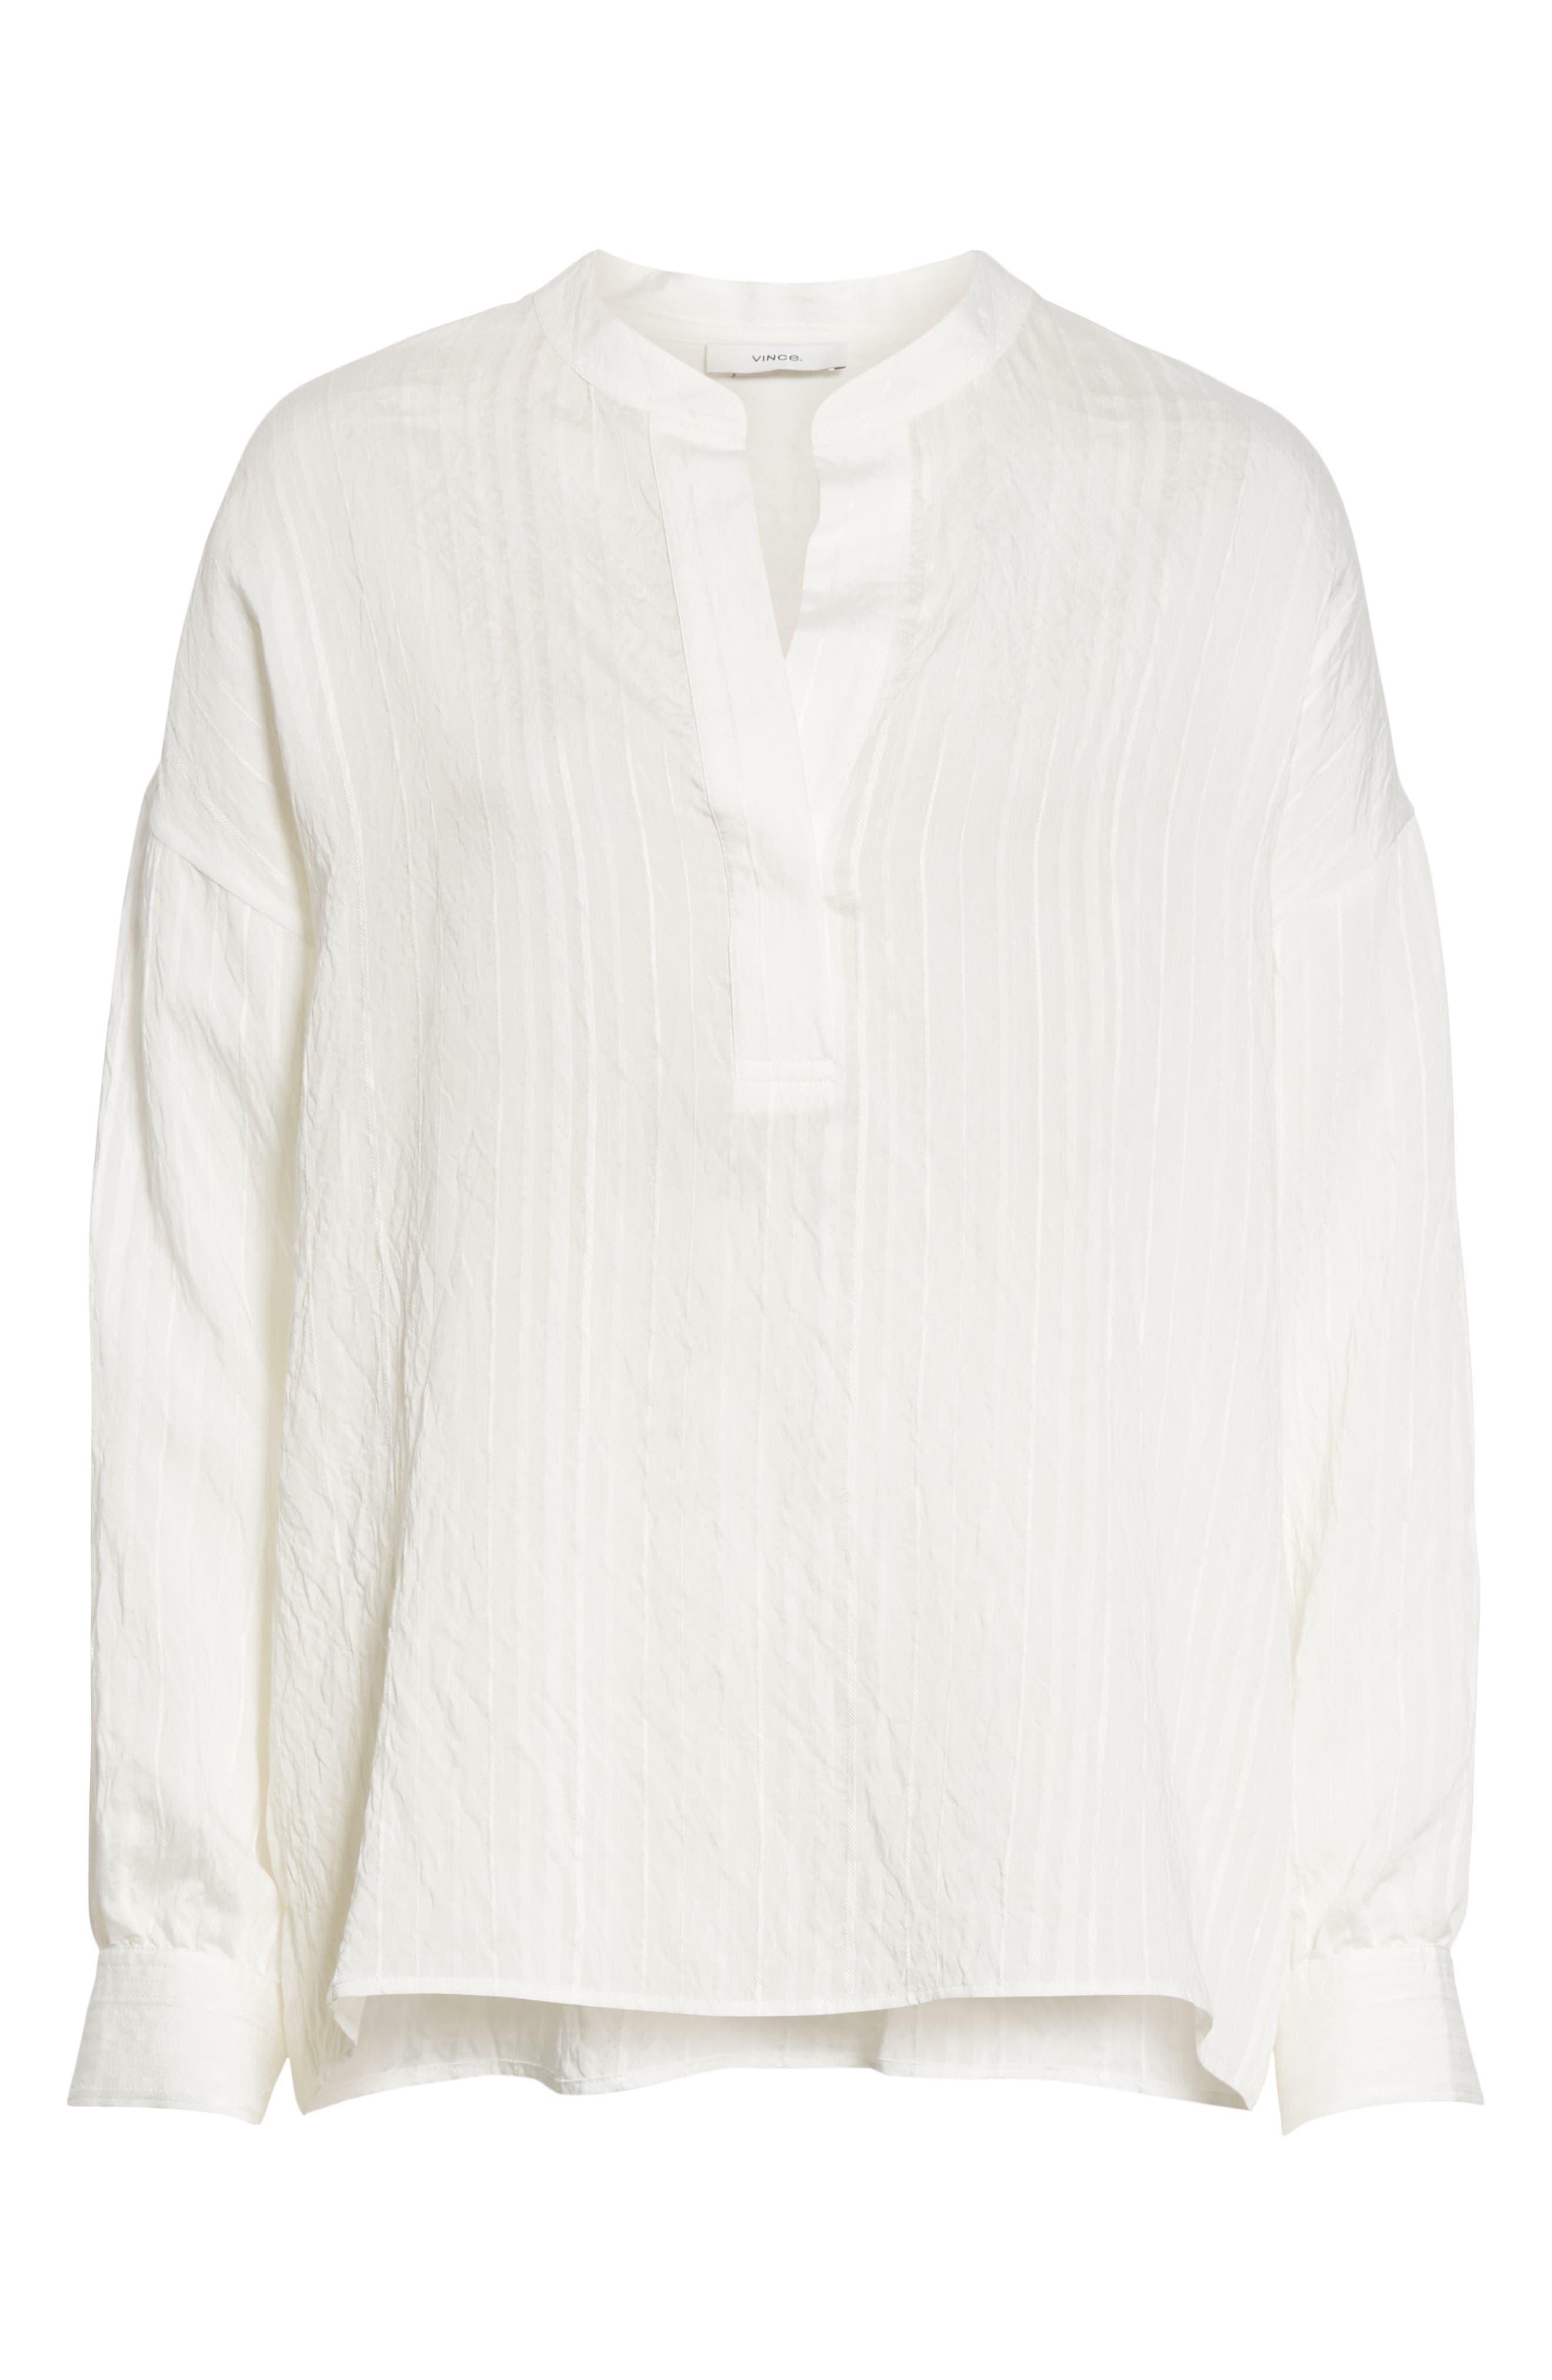 VINCE, Stripe Drop Sleeve Shirt, Alternate thumbnail 6, color, OPTIC WHITE